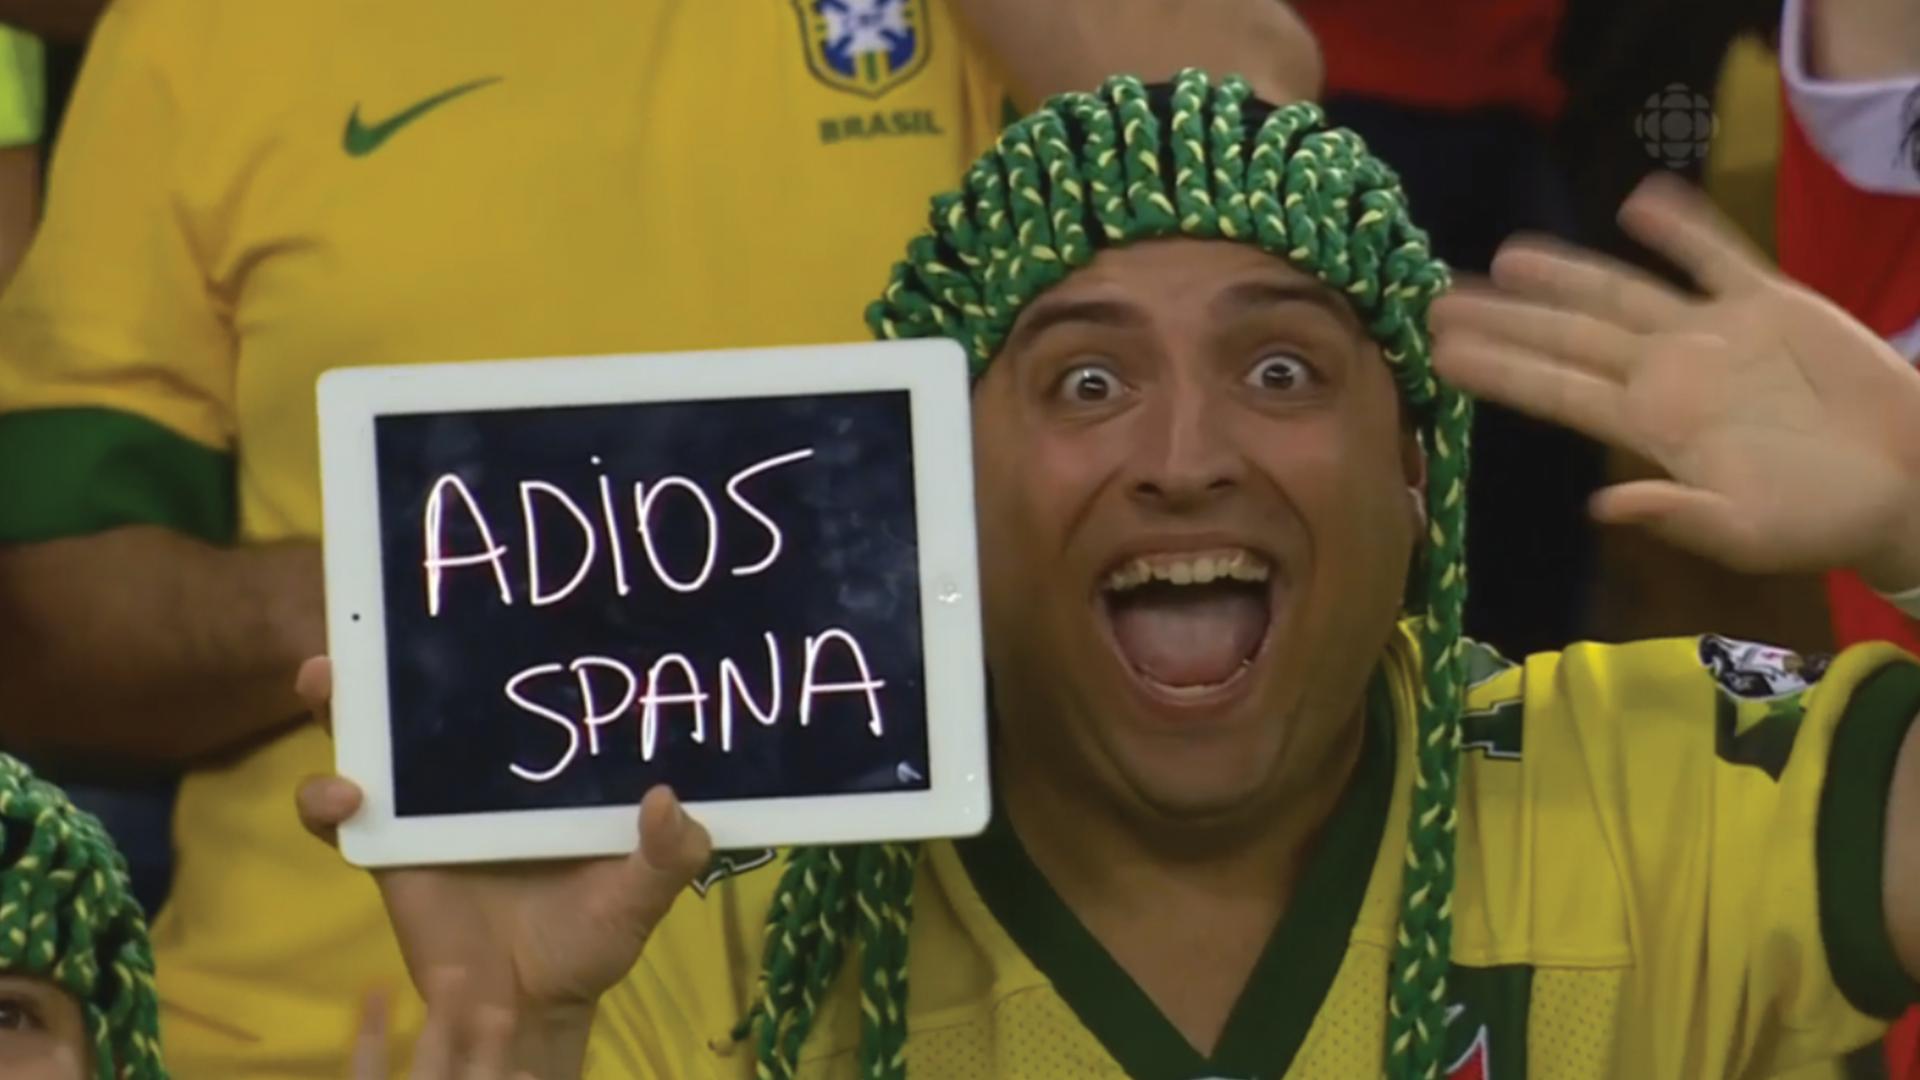 The real MVP of the Spain vs. Chile game. .. E S P A Ñ A...PINCHE CHILENO IGNORANTE ! fifa world cup 2014 spain Chile Adios spana the game